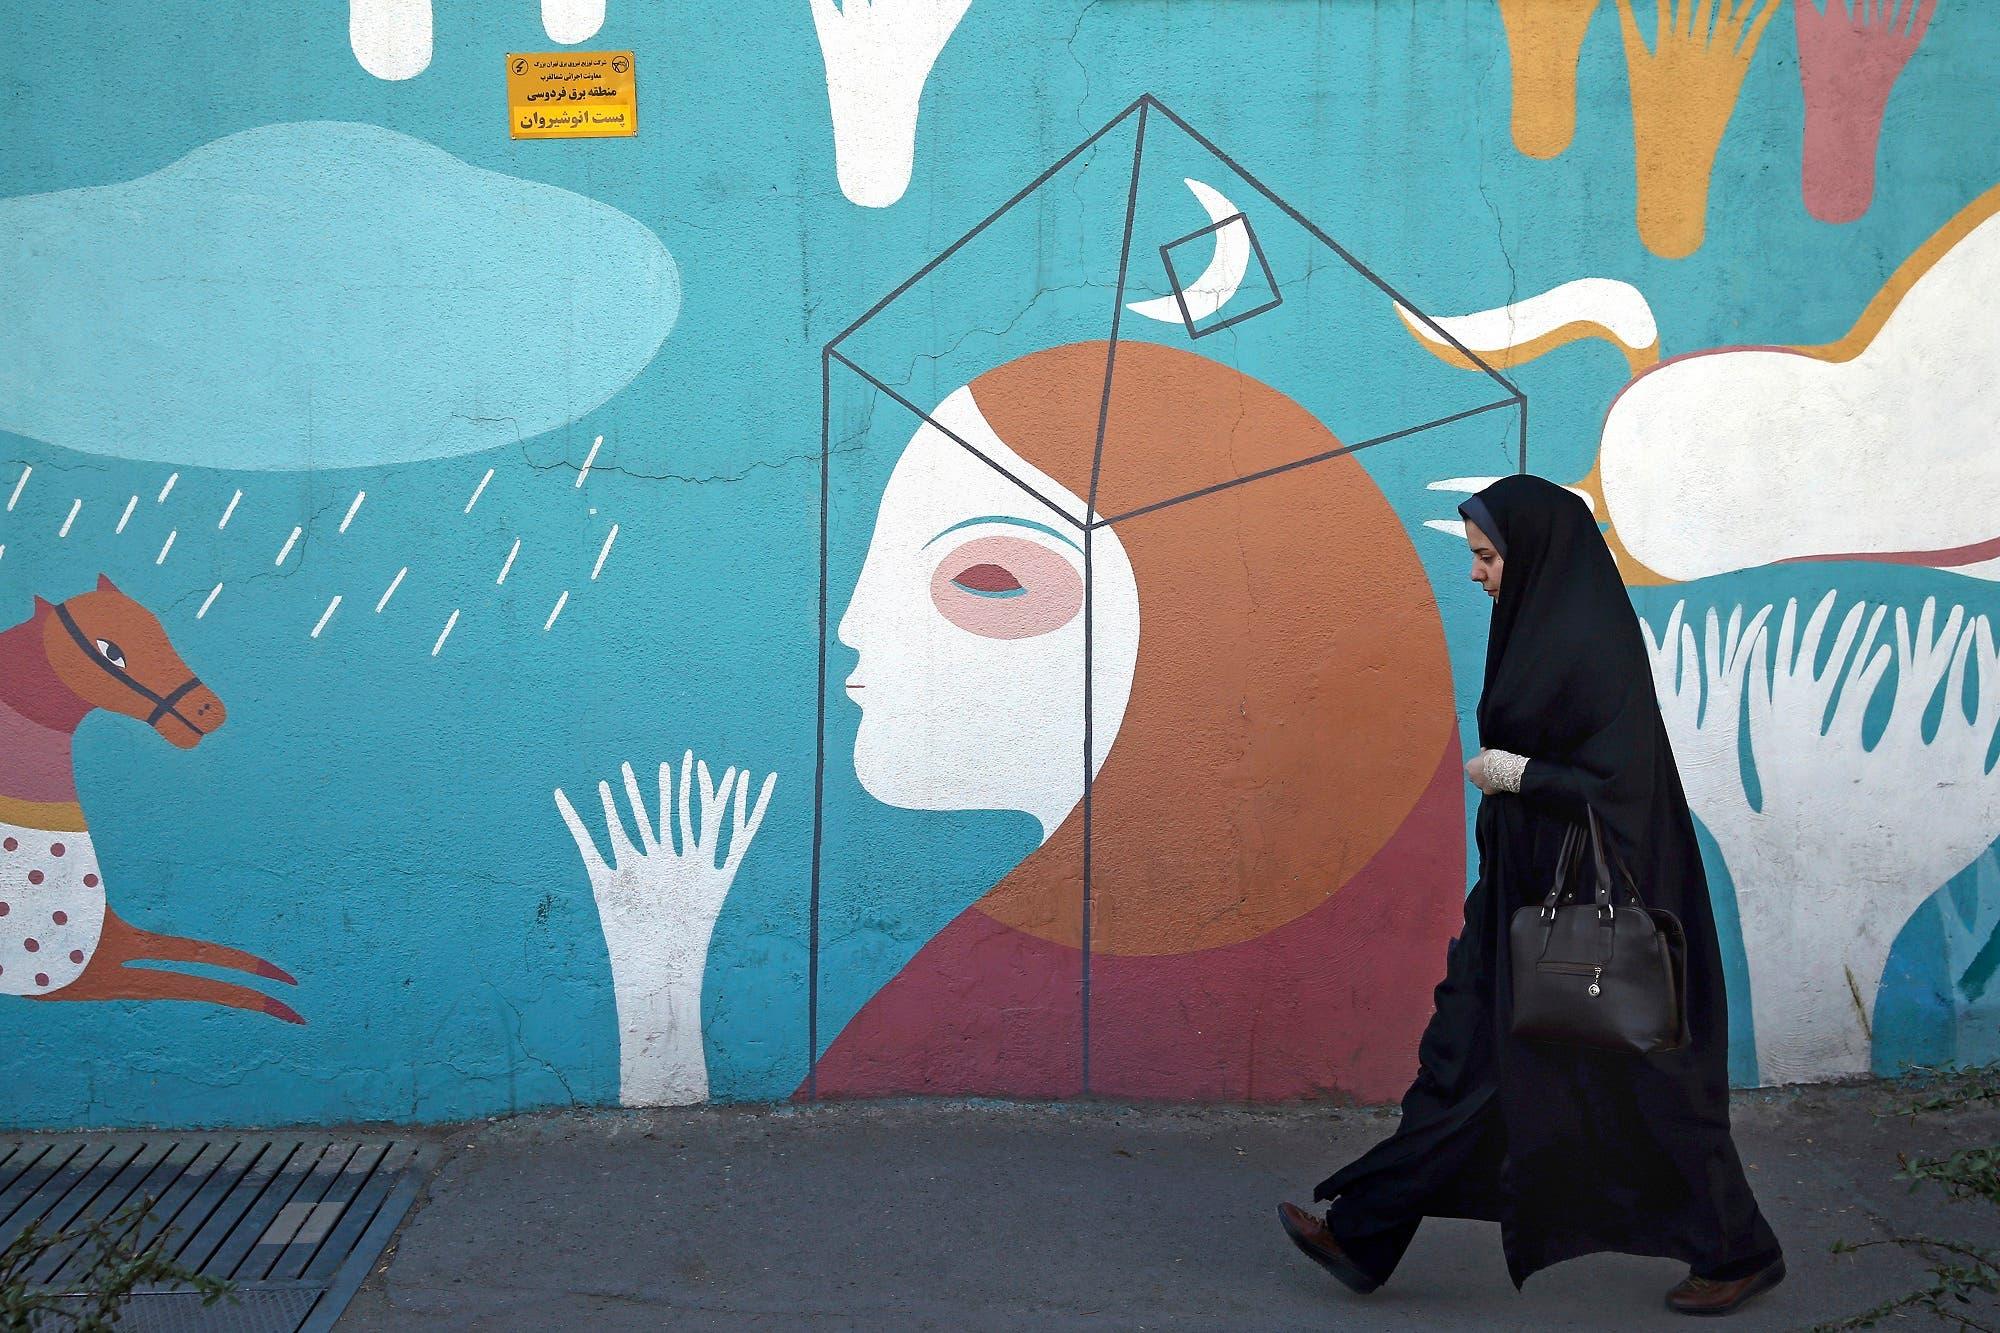 A woman walks past a mural in downtown Tehran, Iran, Wednesday, Jan. 3, 2018. (AP)